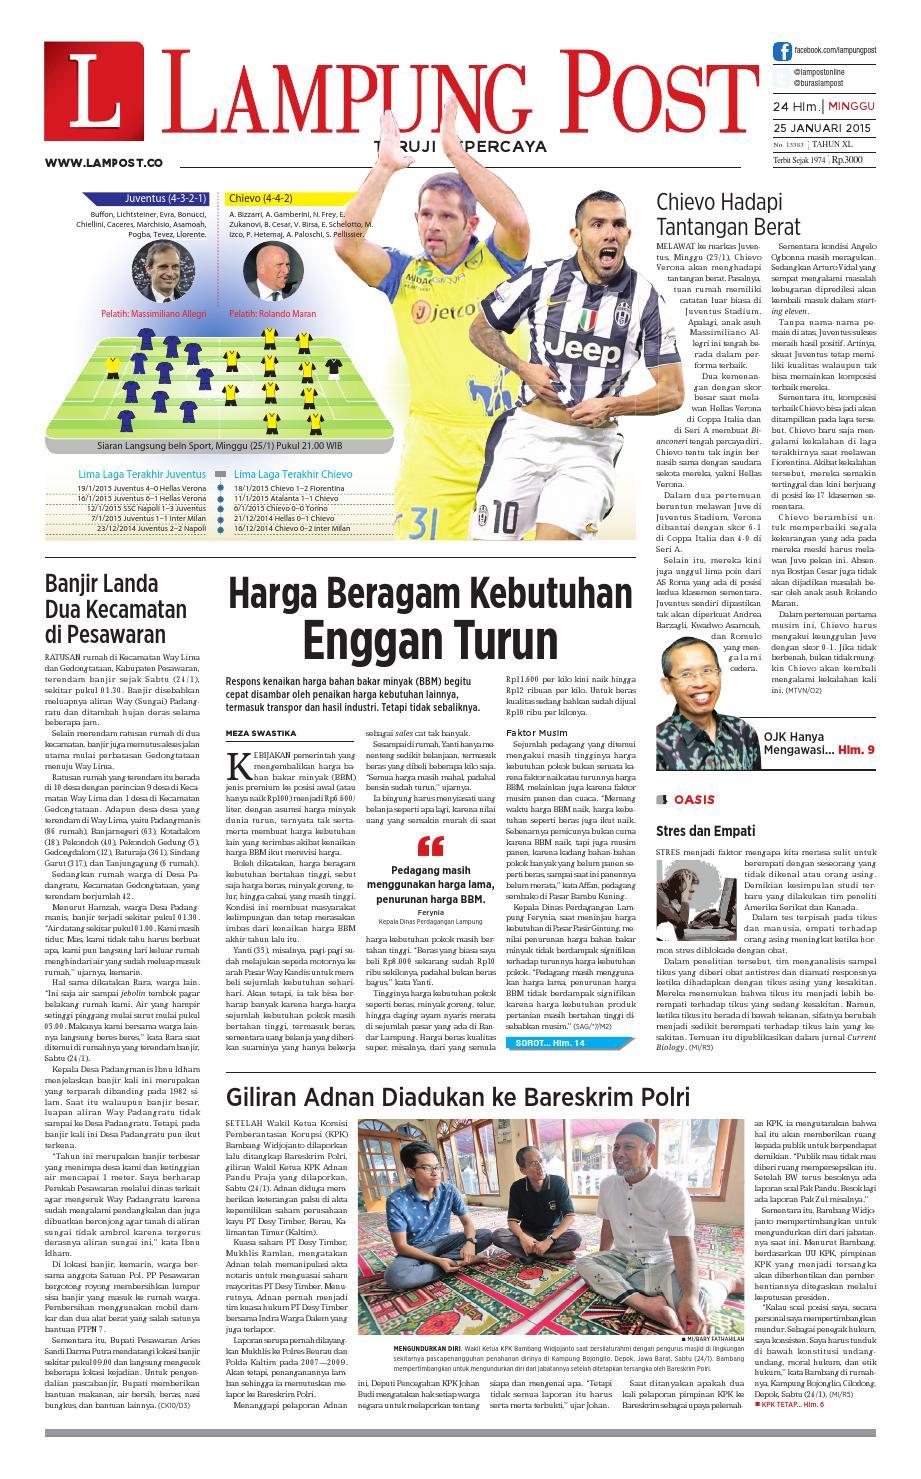 Lampung Post Minggu 25 Januari 2015 By Issuu Tcash Vaganza 39 Bantal Mobil 3 In 1 Juventus Aksesoris